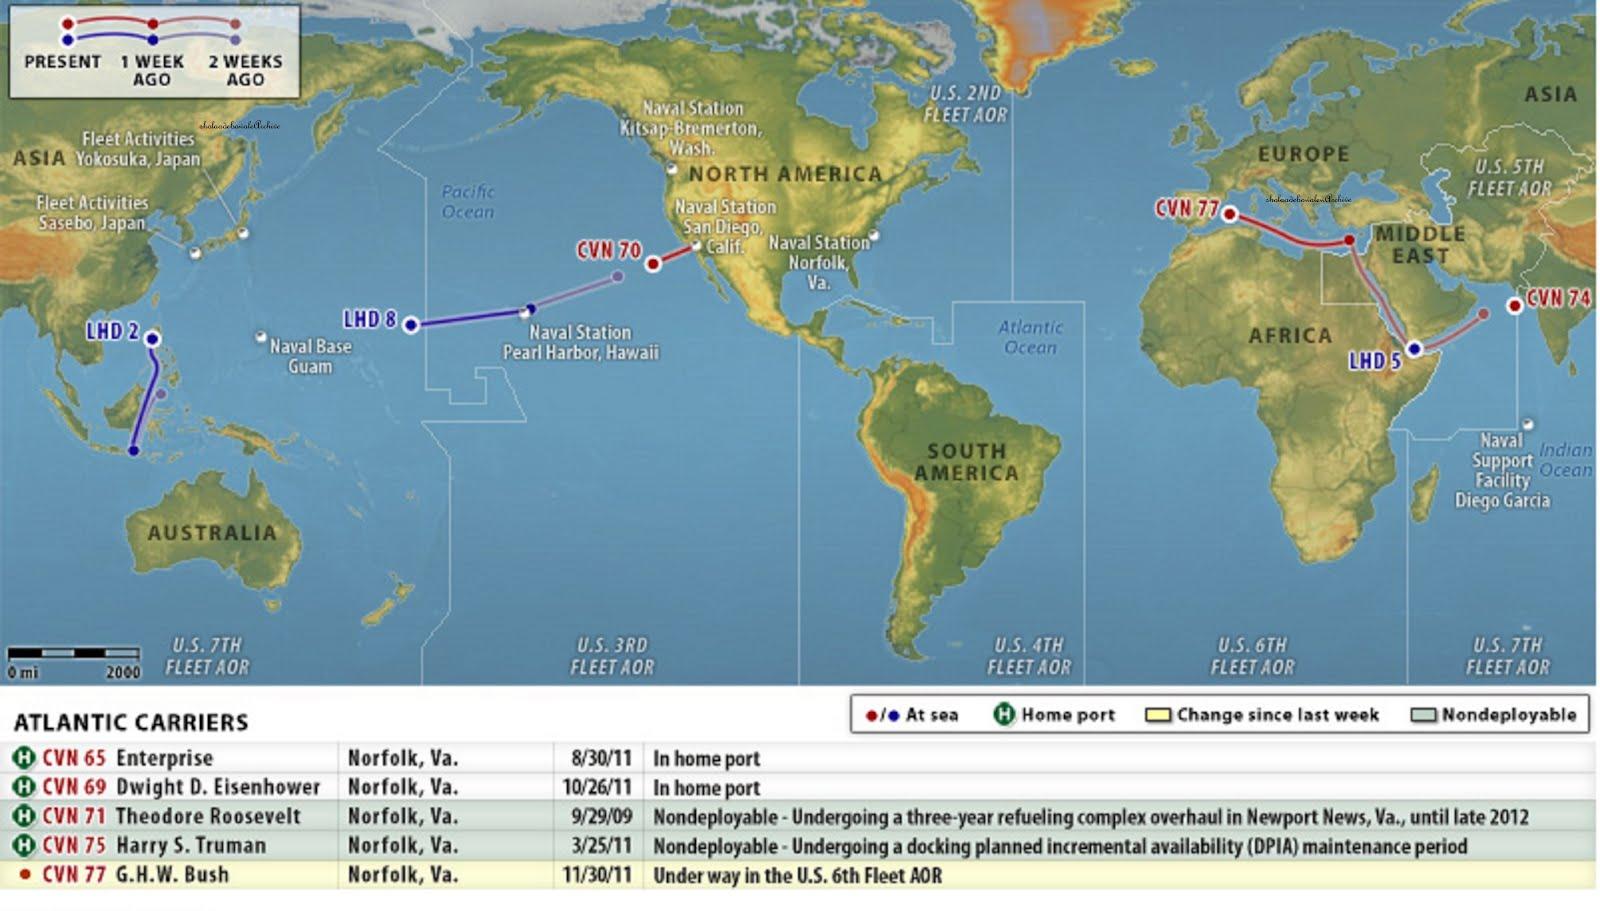 SHOLA ADEBOWALEcom US AIRCRAFT CARRIER USS ENTERPRISE MAKES